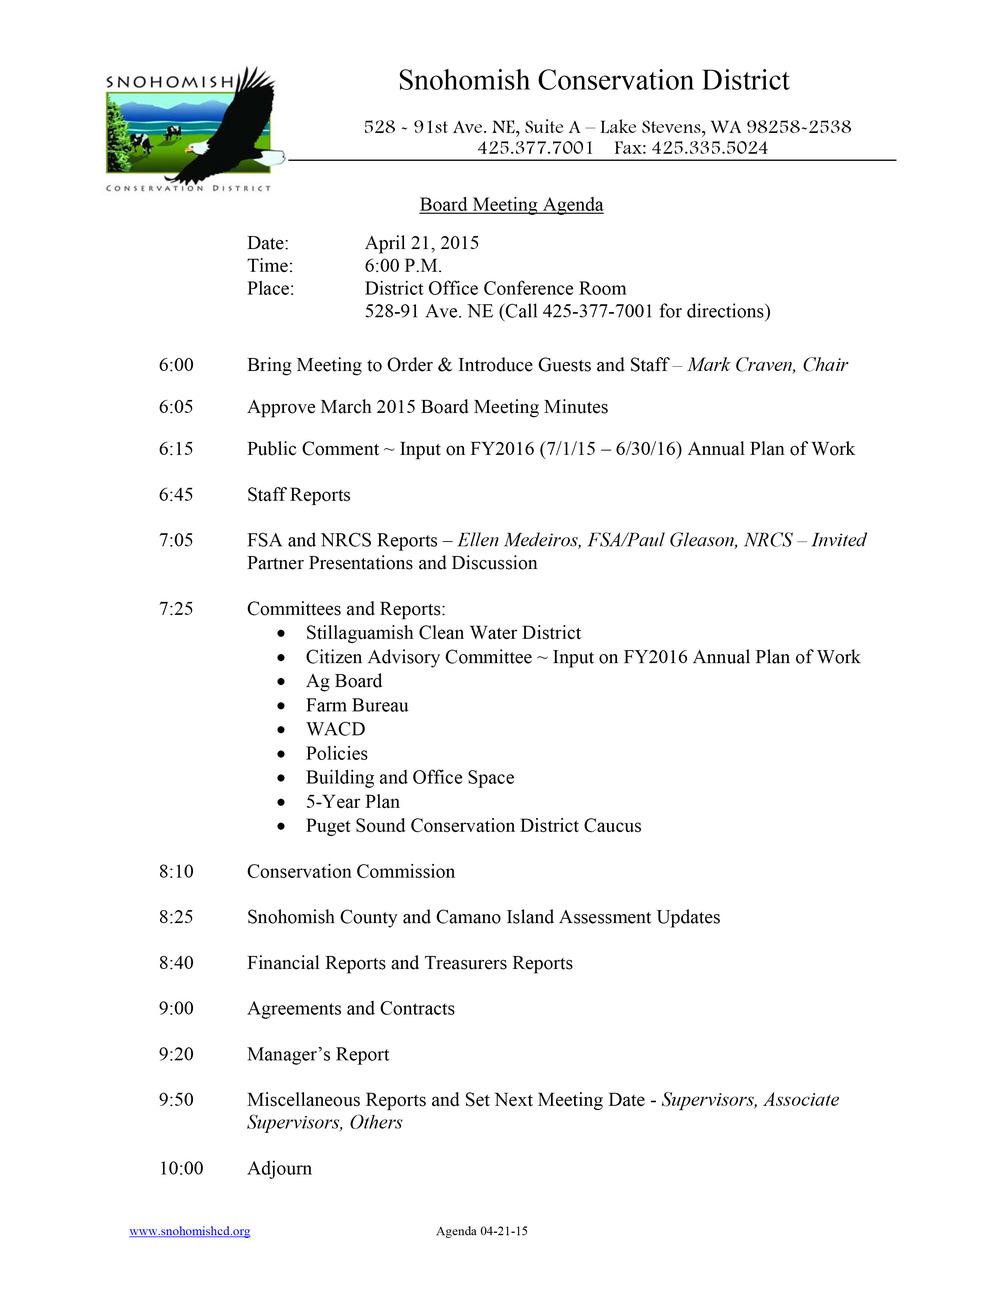 agendas20155.jpg